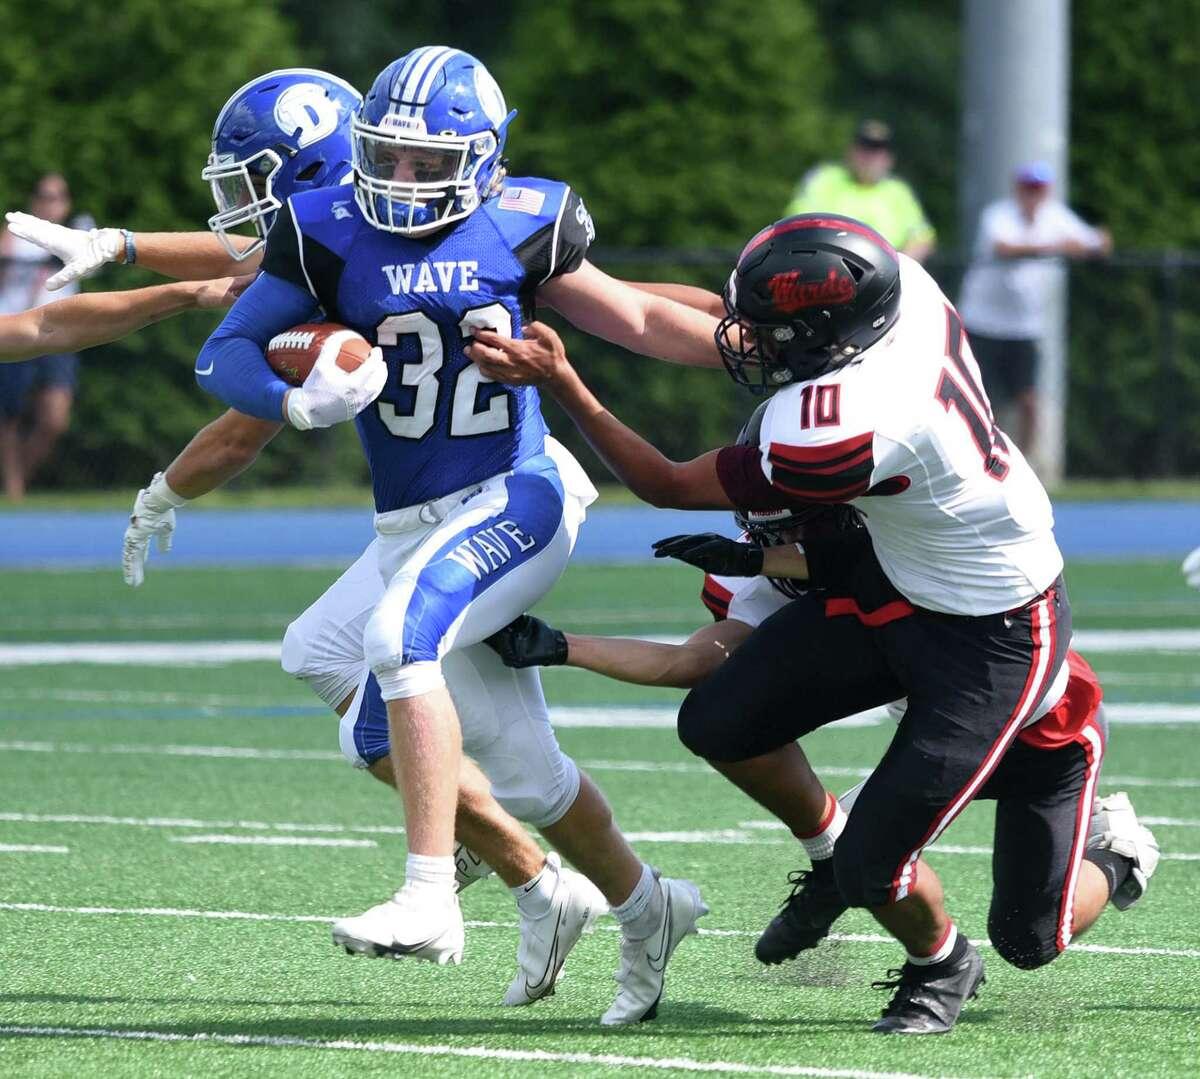 Darien running back Tighe Cummiskey (32) battles Warde's Anwar Sakly (10) during a football game at Darien High School on Sat., Sept. 11, 2021.